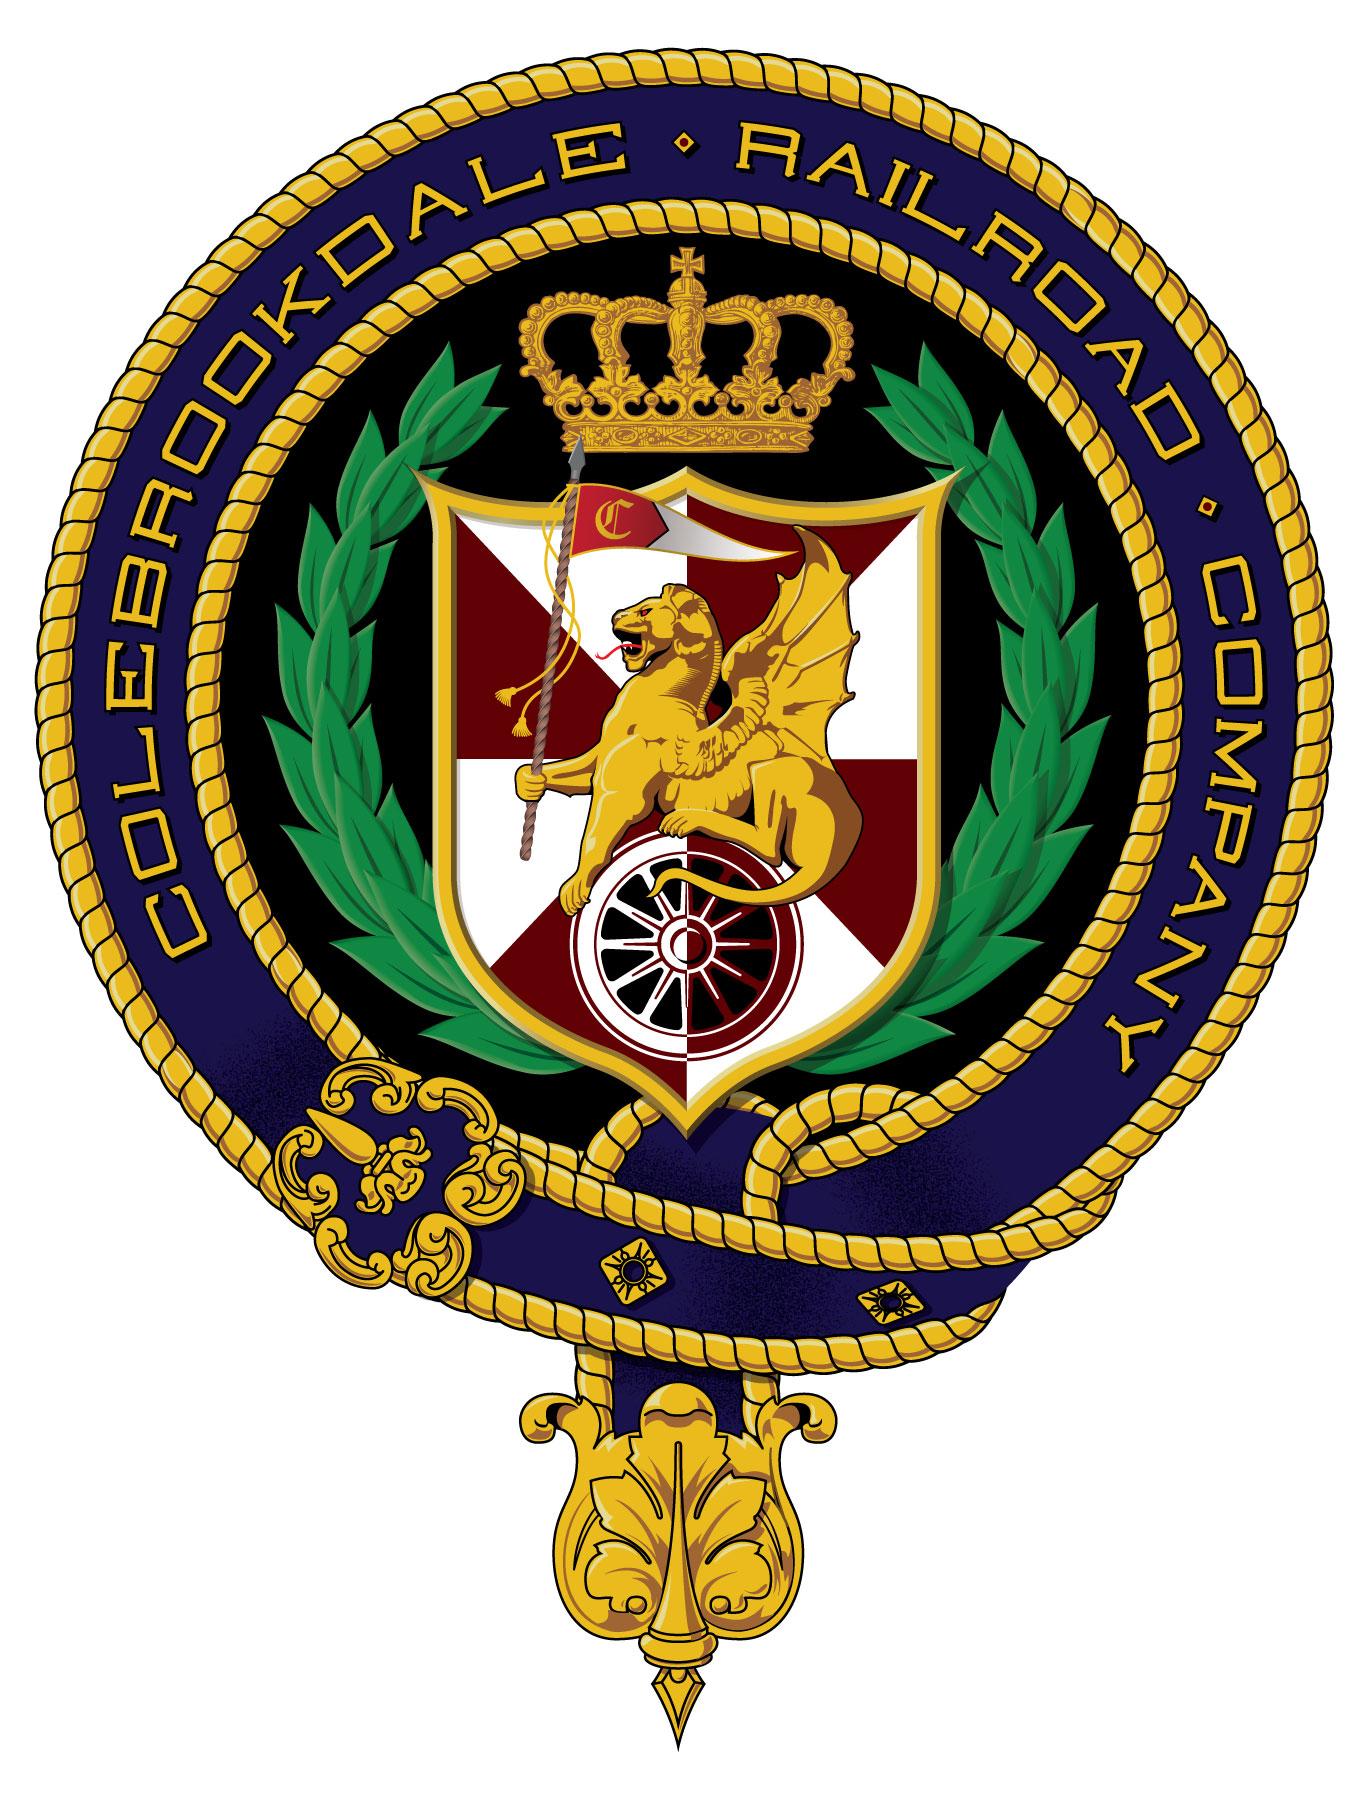 Colebrookdale Railroad Company logo